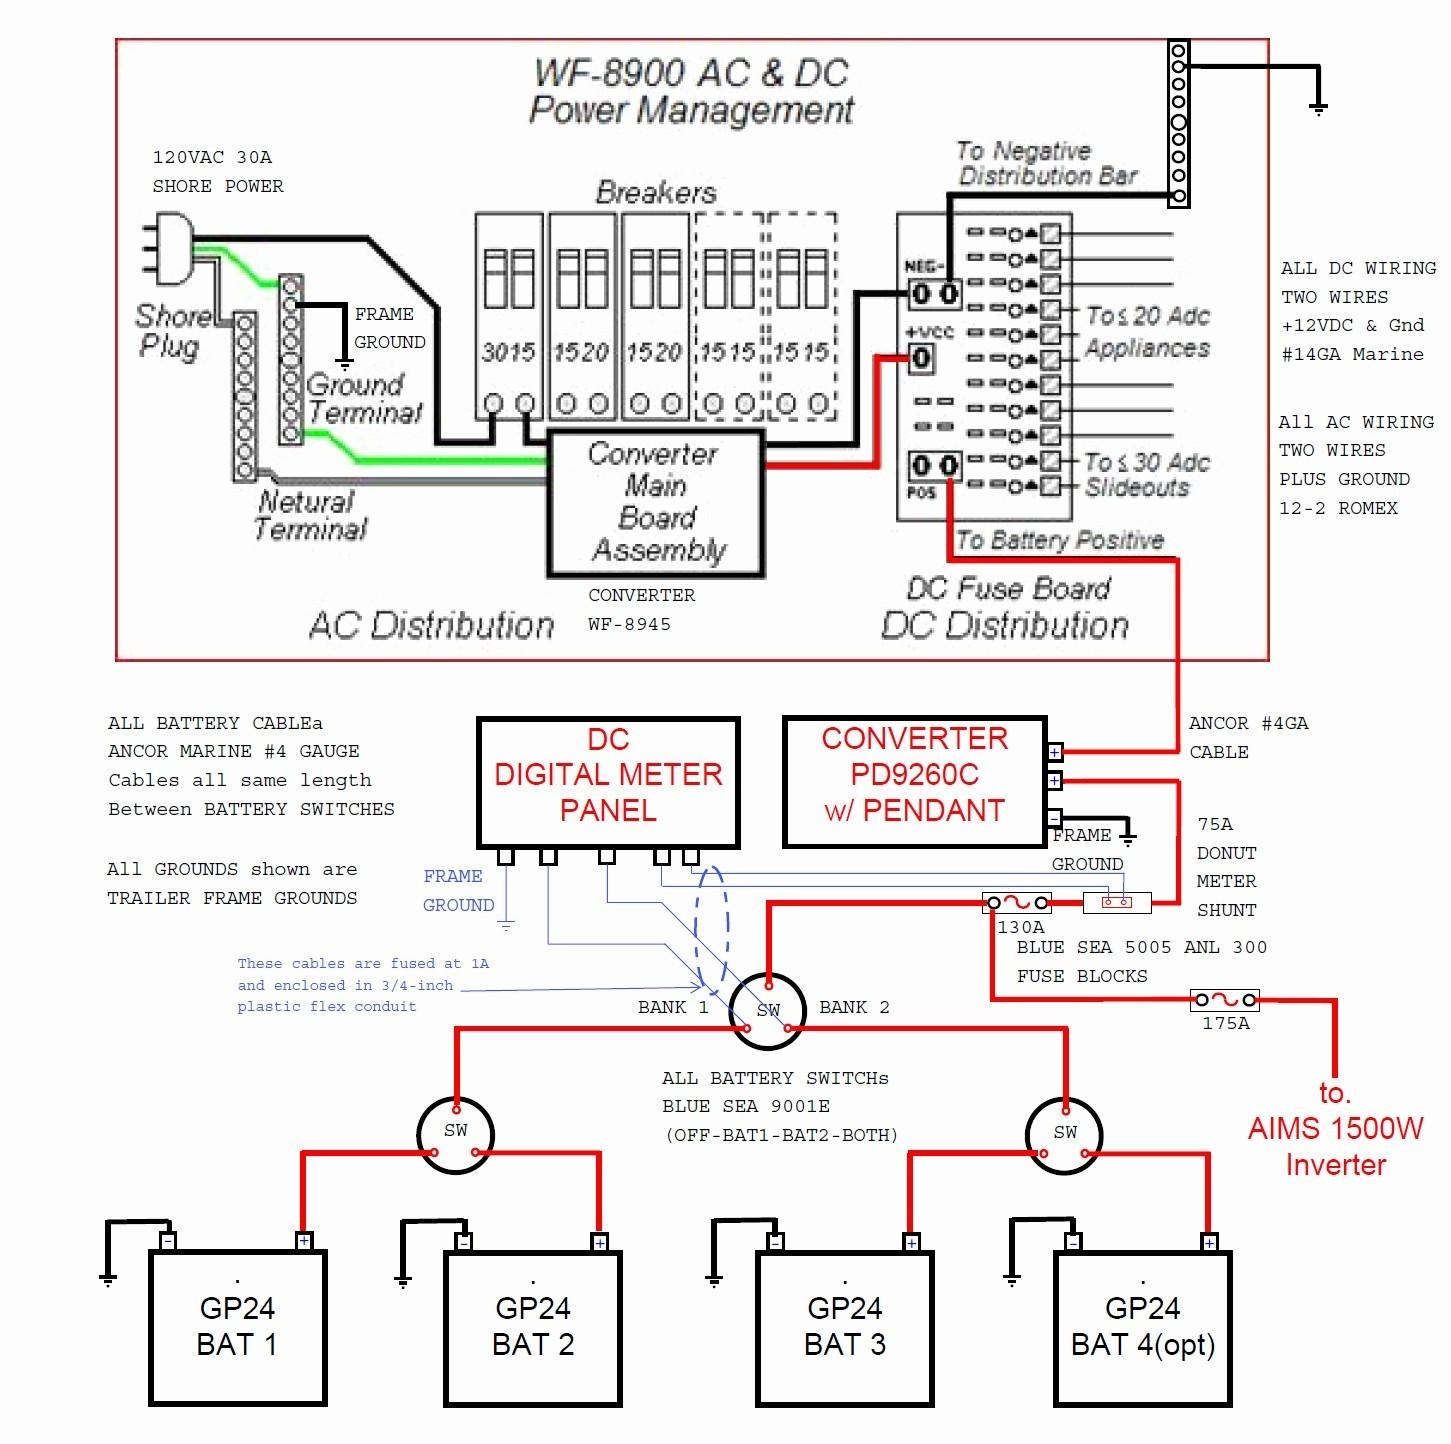 30 Amp Twist Lock Plug Wiring Diagram Wiring Diagram 30 Amp Plug Refrence 30 Amp Wiring Diagram Rate Amp Of 30 Amp Twist Lock Plug Wiring Diagram